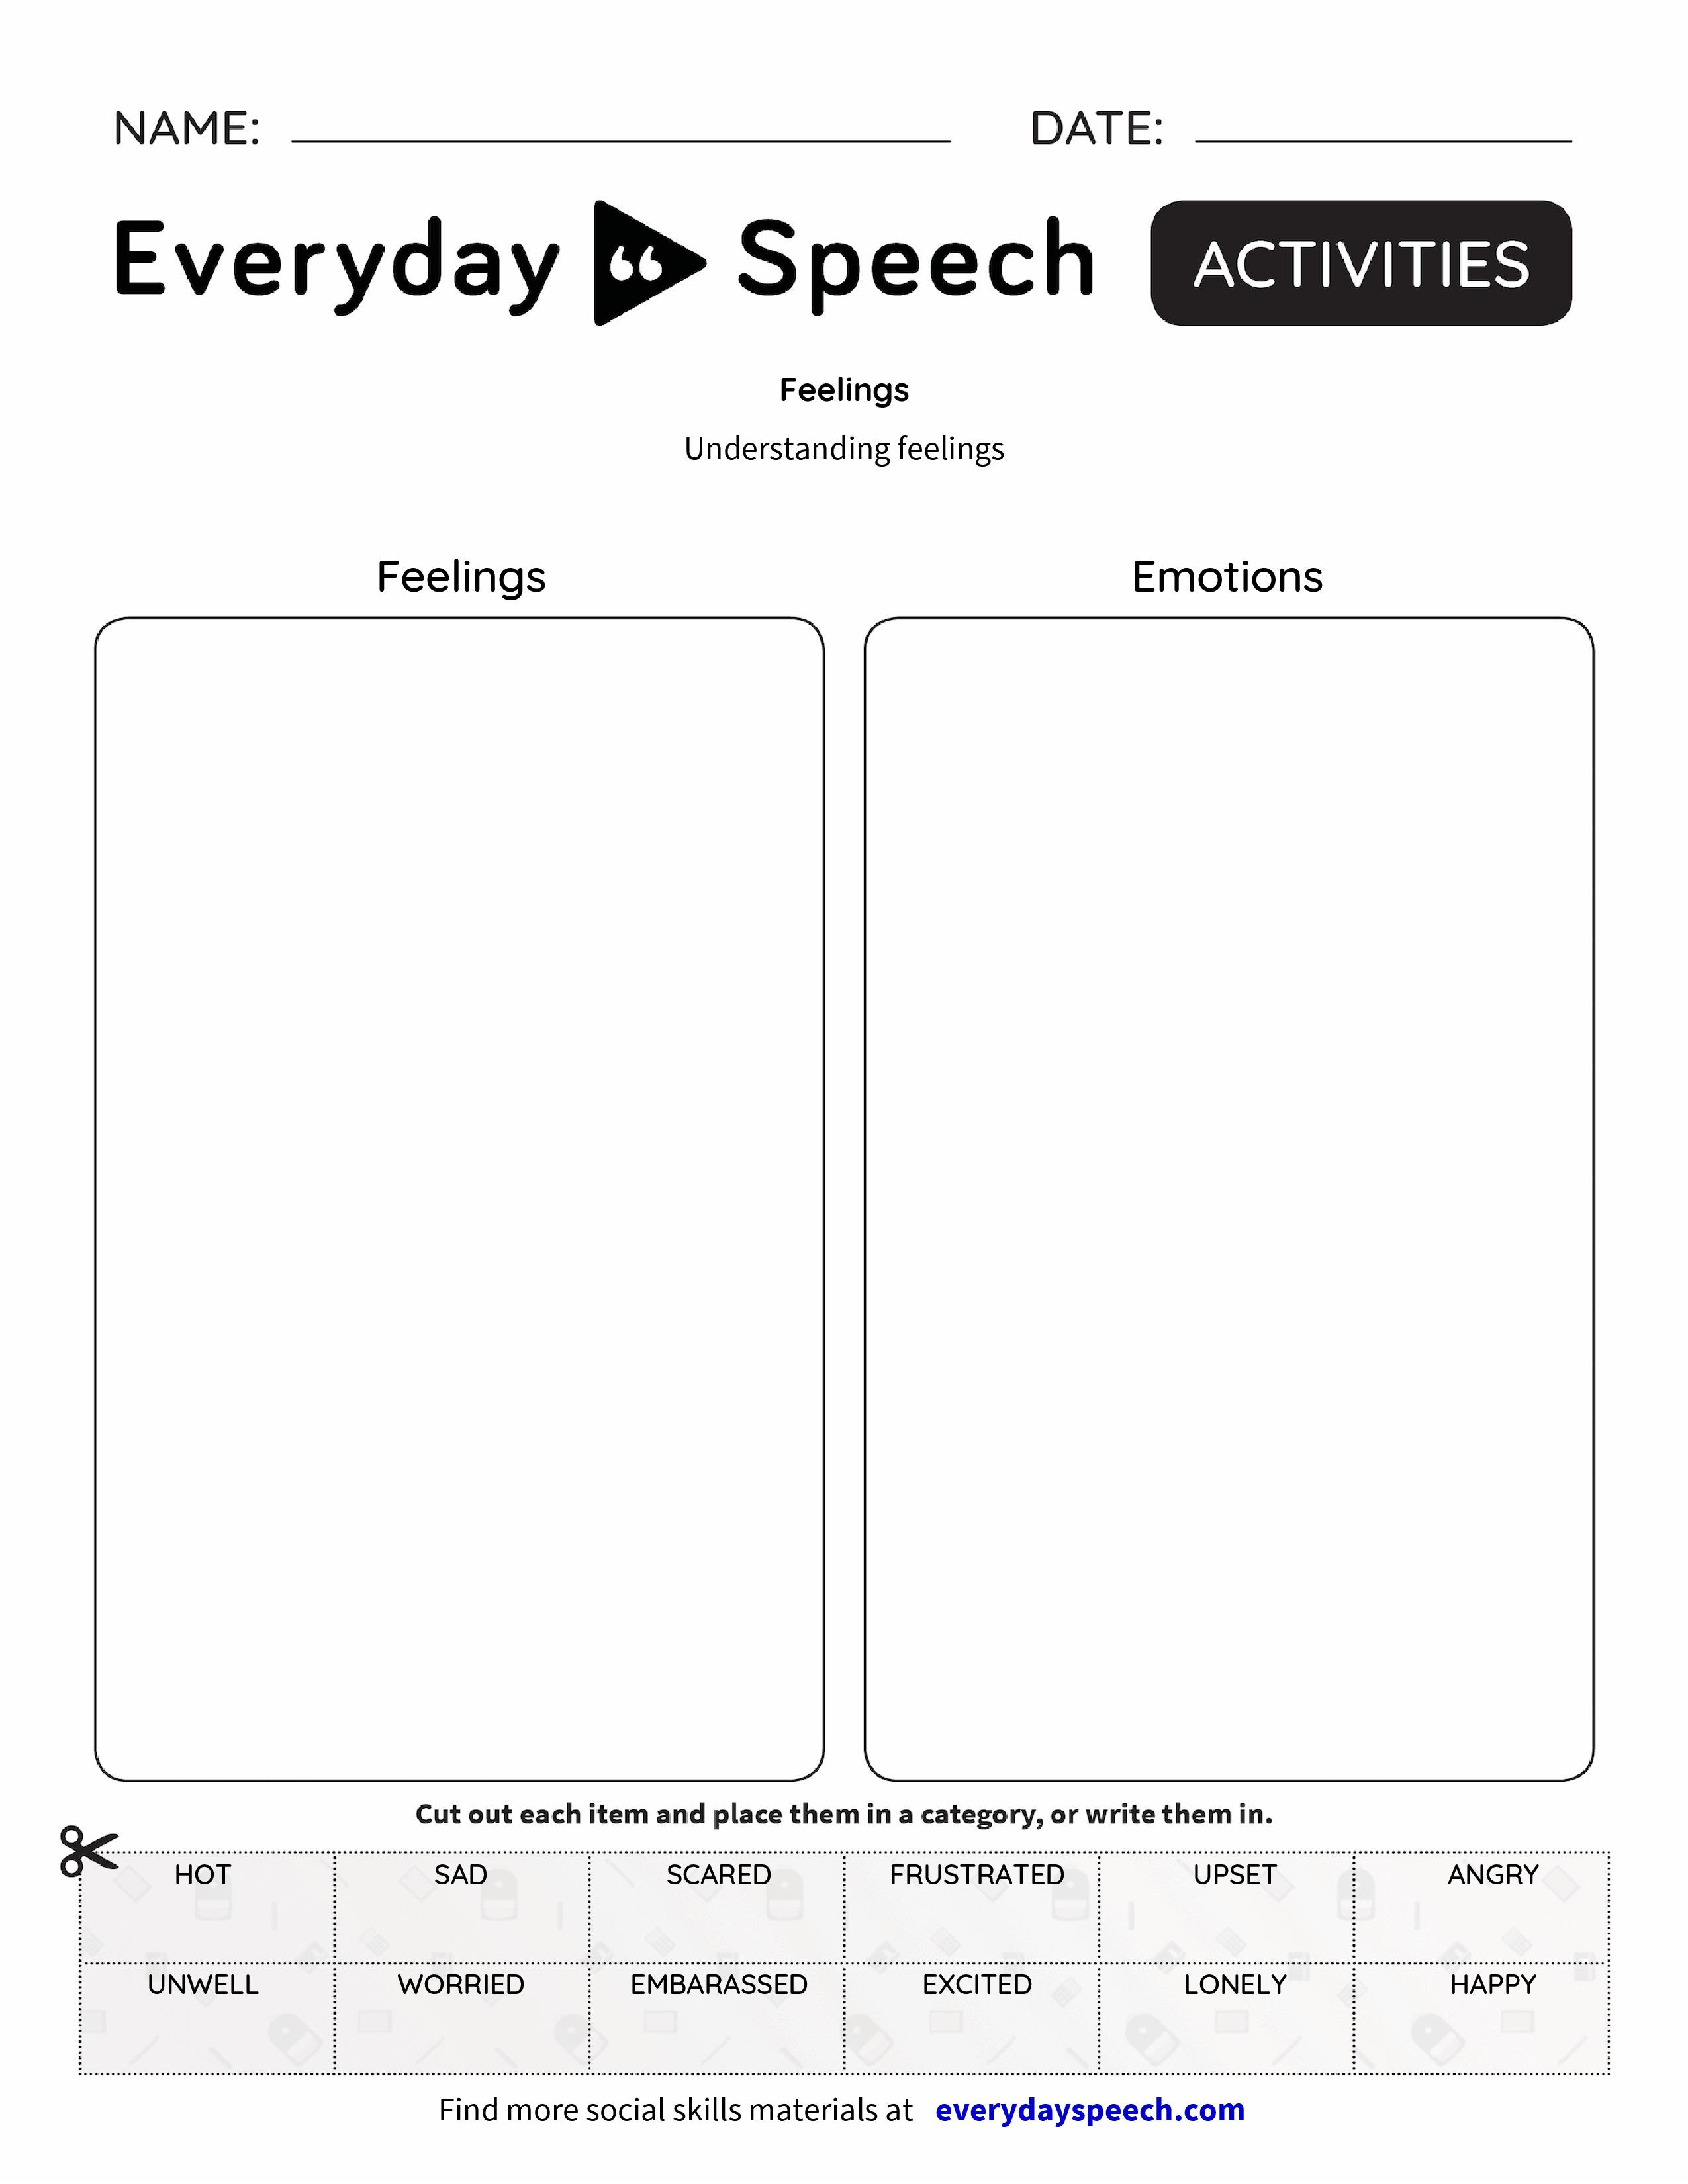 Feelings - Everyday Speech - Everyday Speech